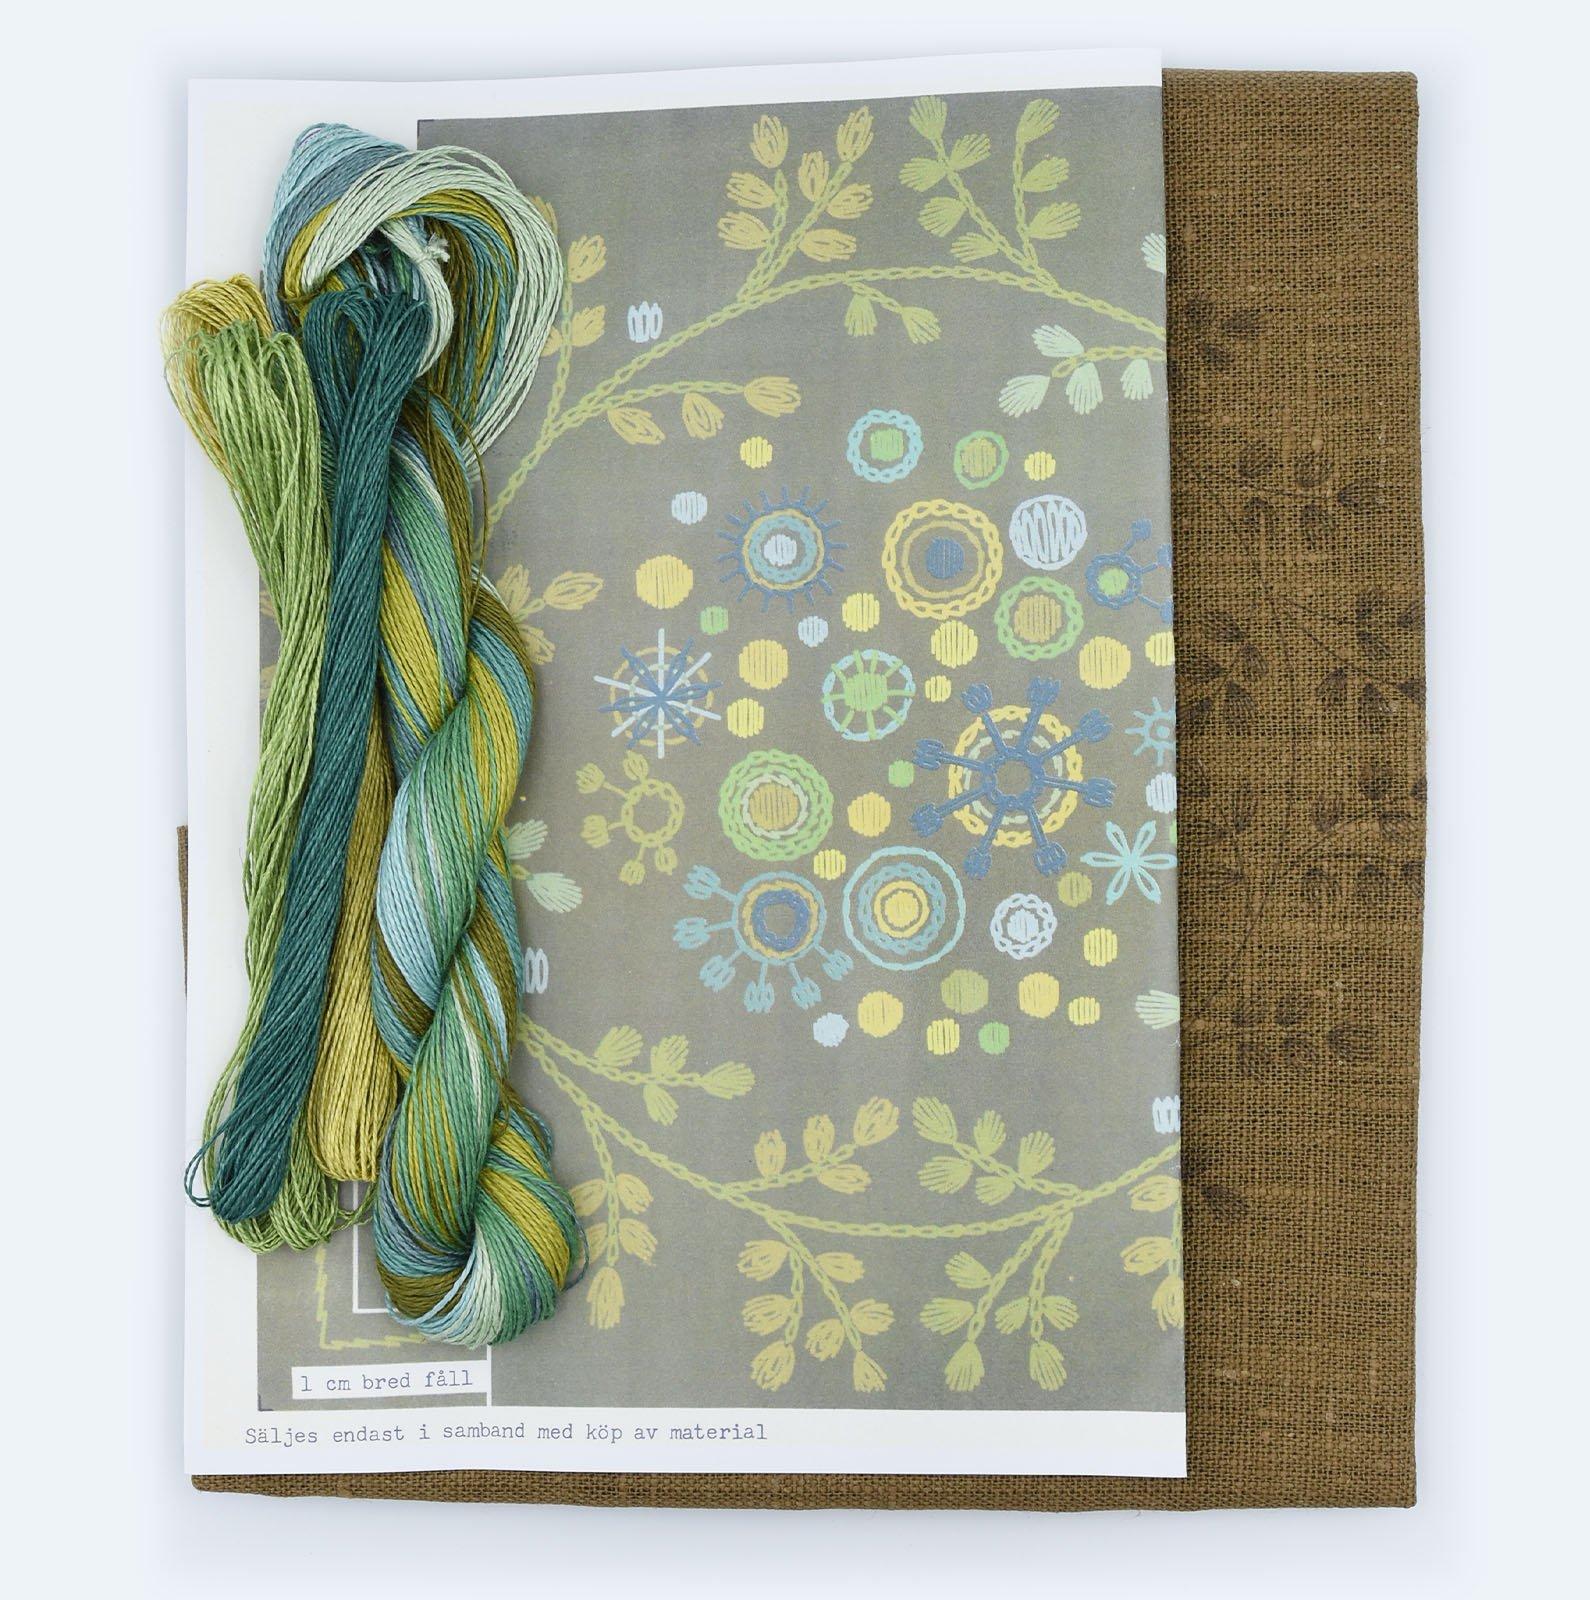 Linladan - Woodland Wreath - Cushion Kit with linen thread